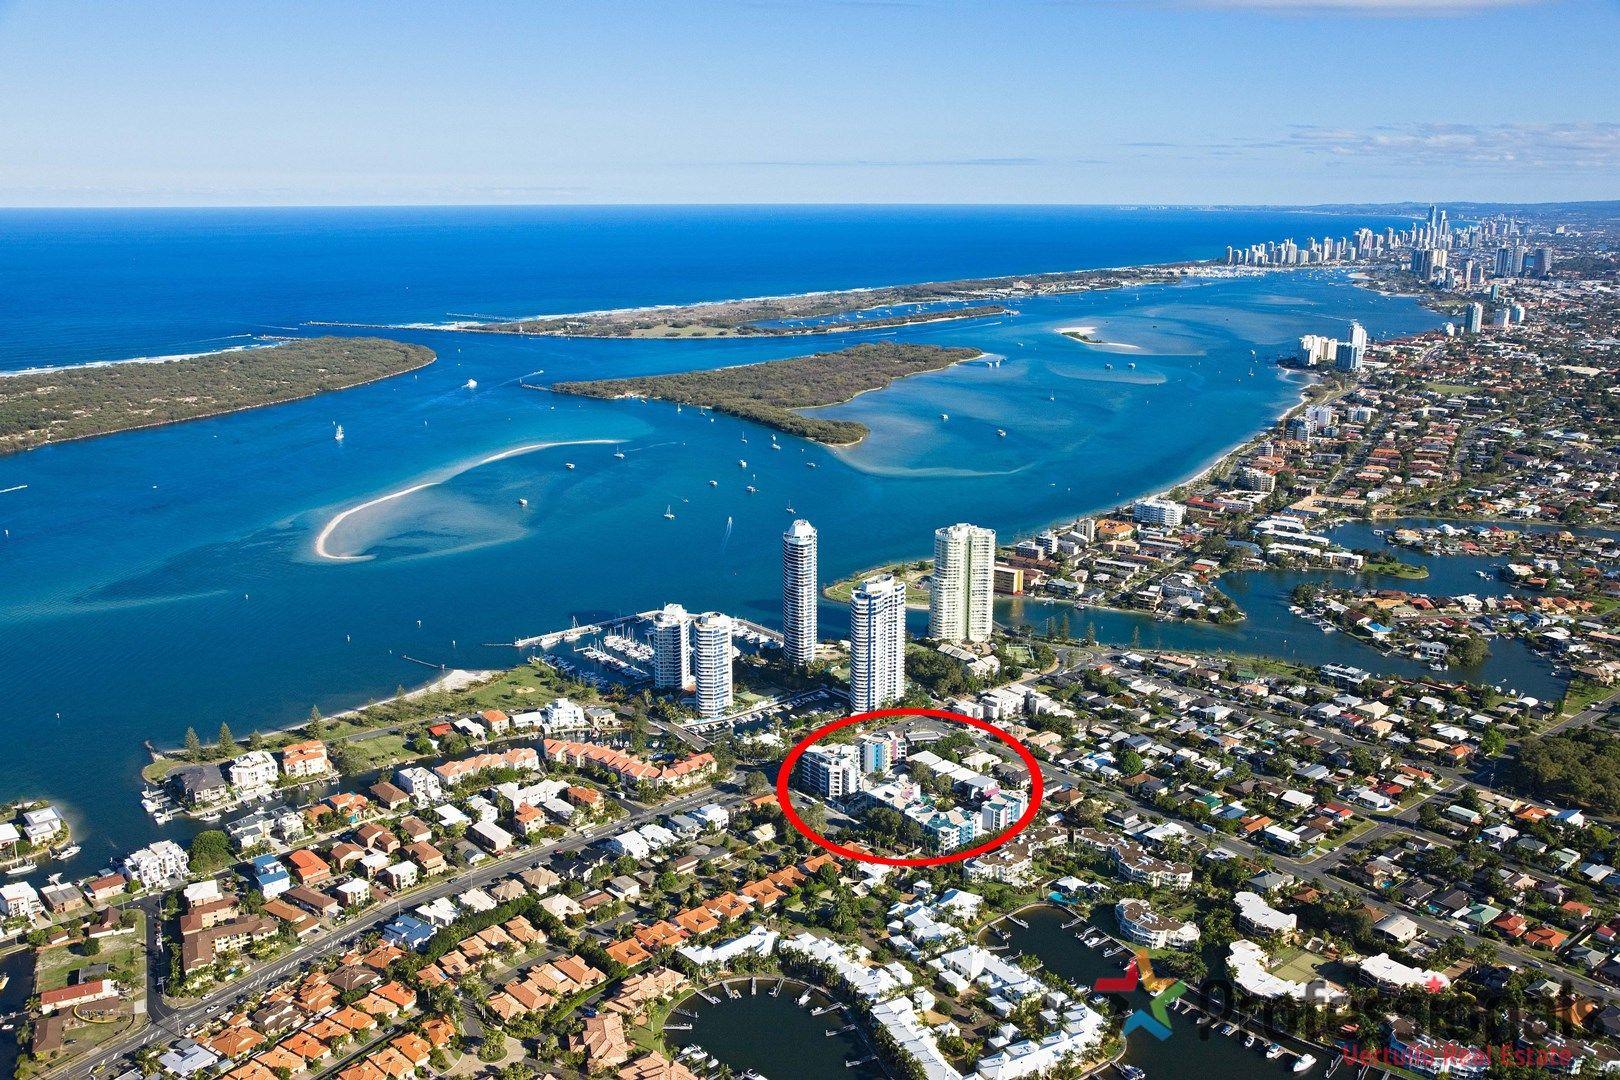 5A/28 Bayview Street, Runaway Bay QLD 4216, Image 1